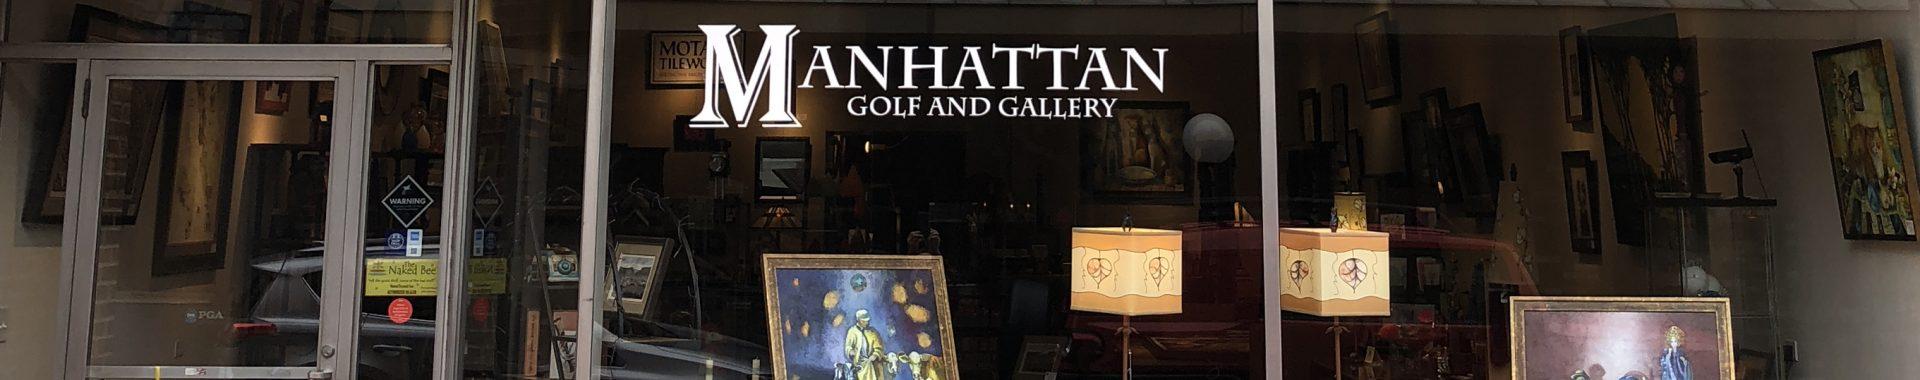 Manhattan Golf and Gallery